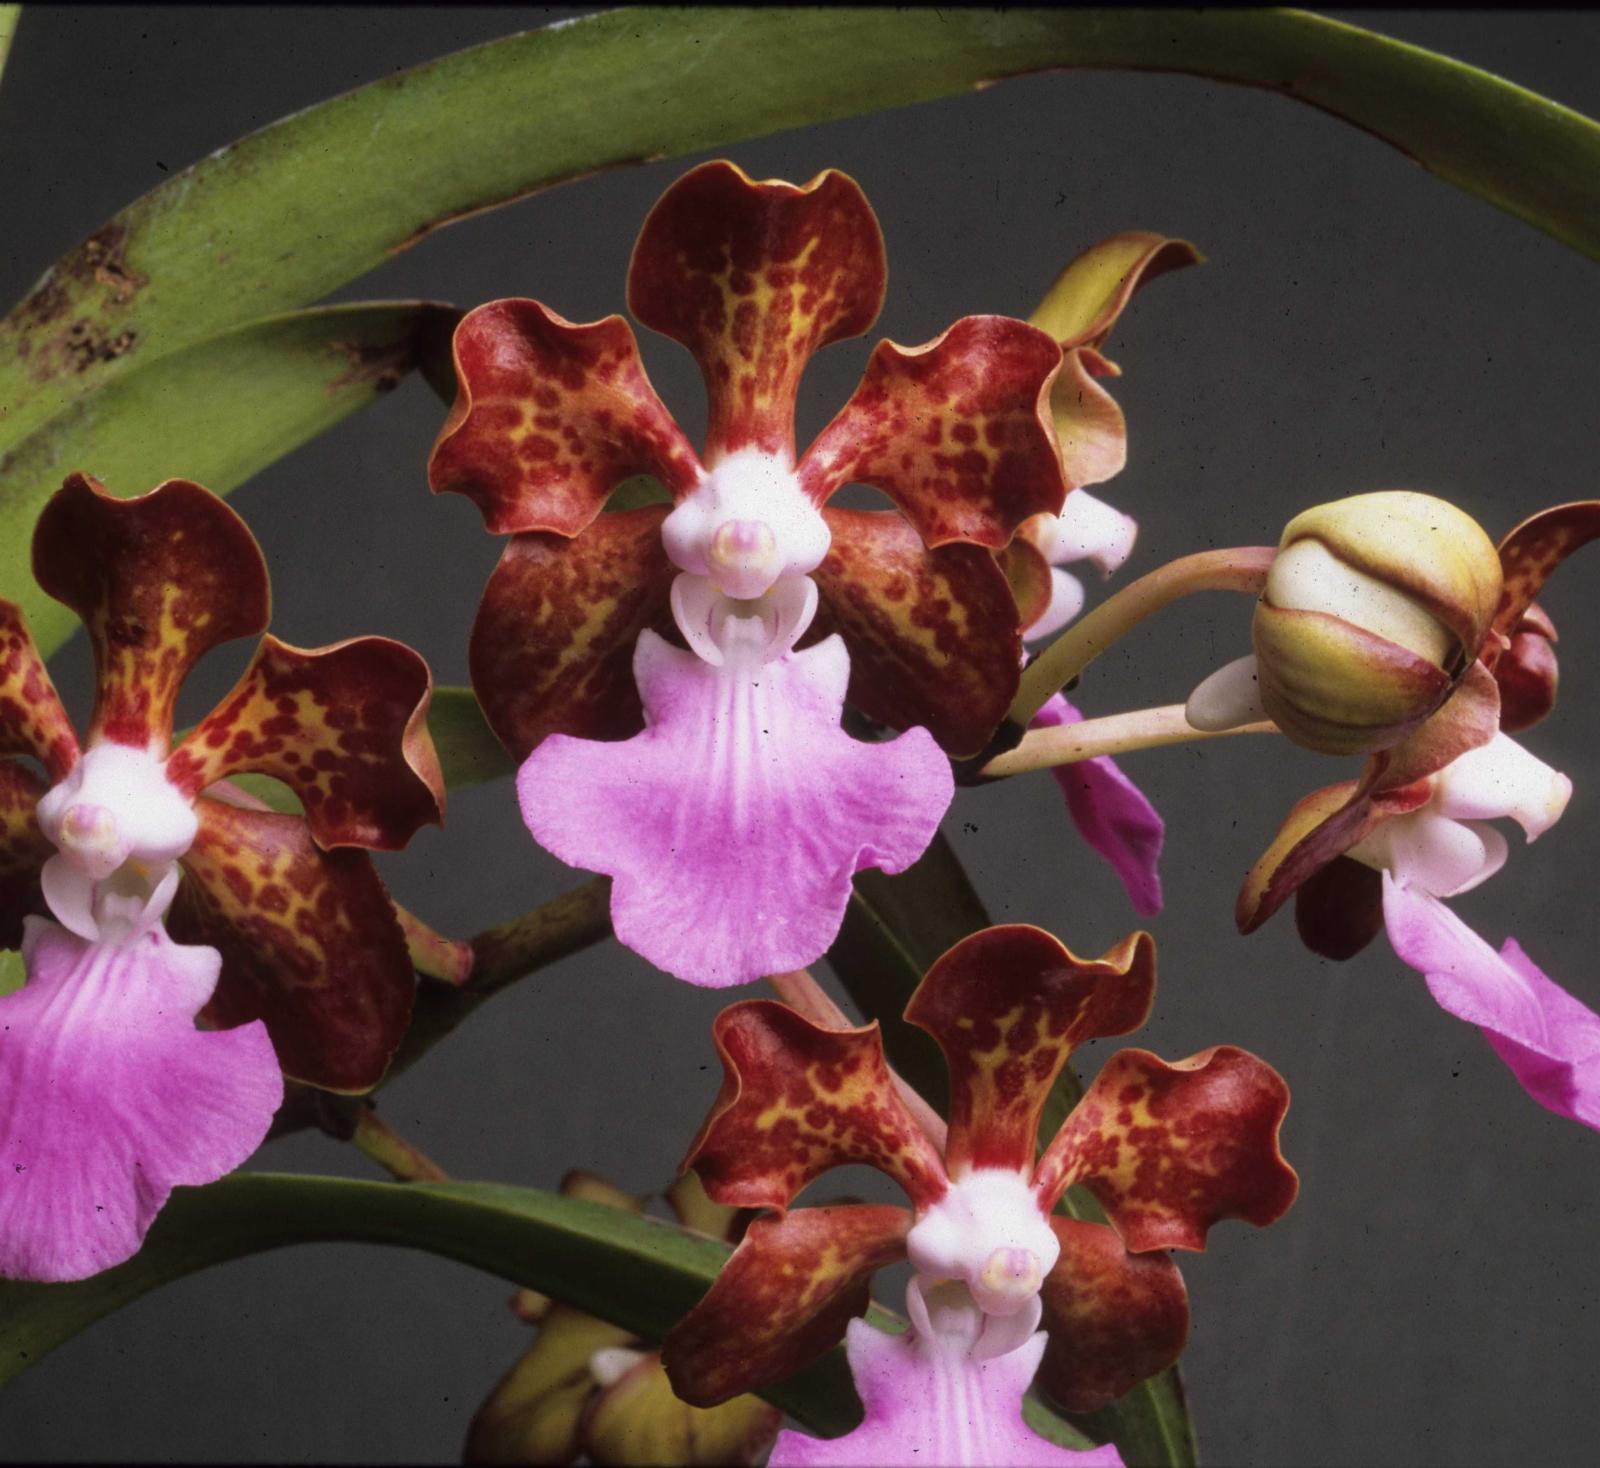 Vanda Insignis Blume Plants Of The World Online Kew Science Limbata Images